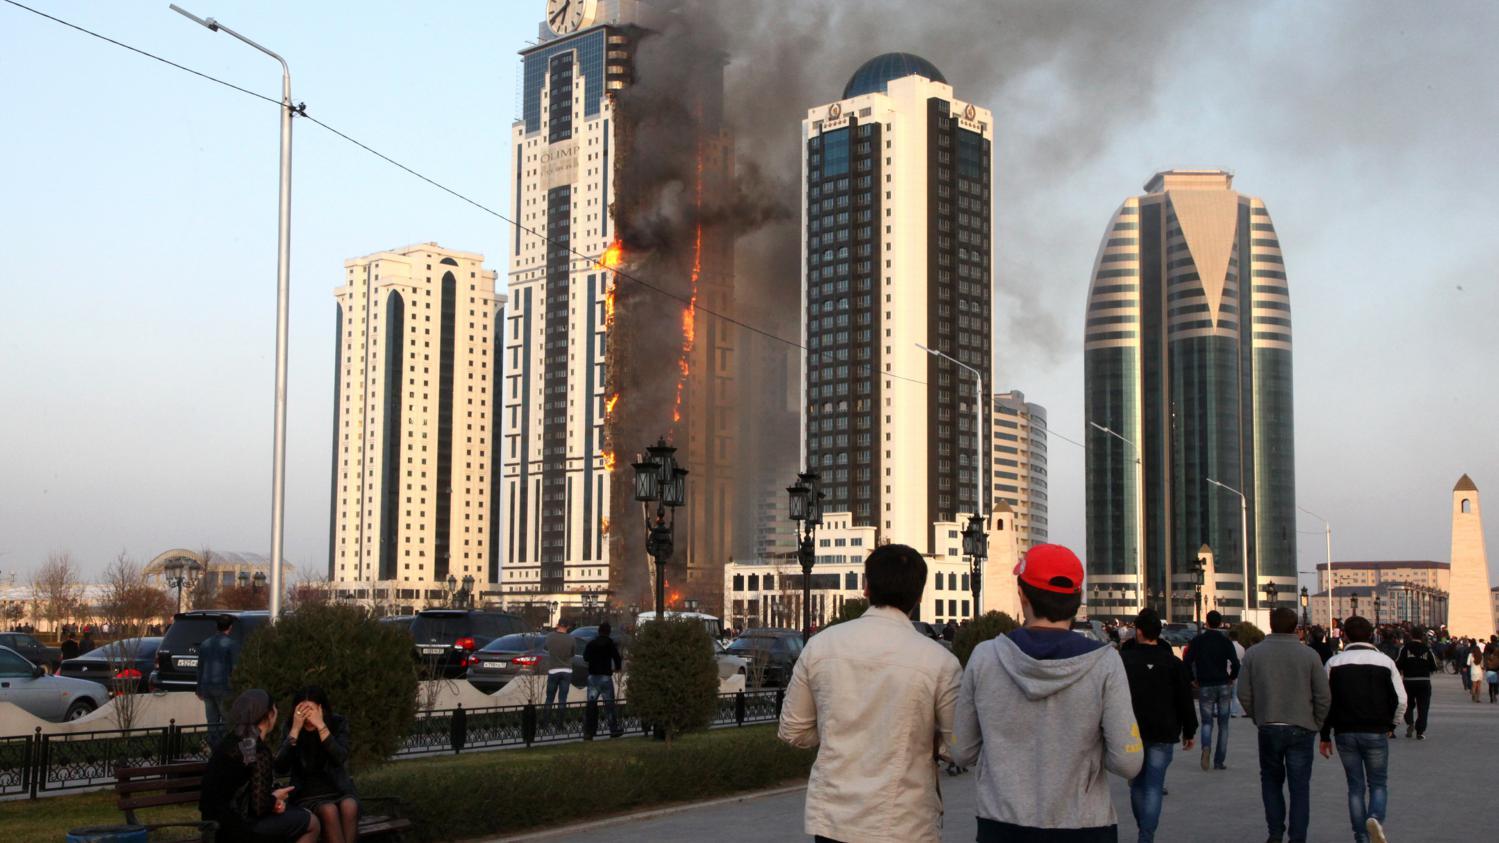 VIDEO A Grozny la rsidence offerte  Grard Depardieu a pris feu